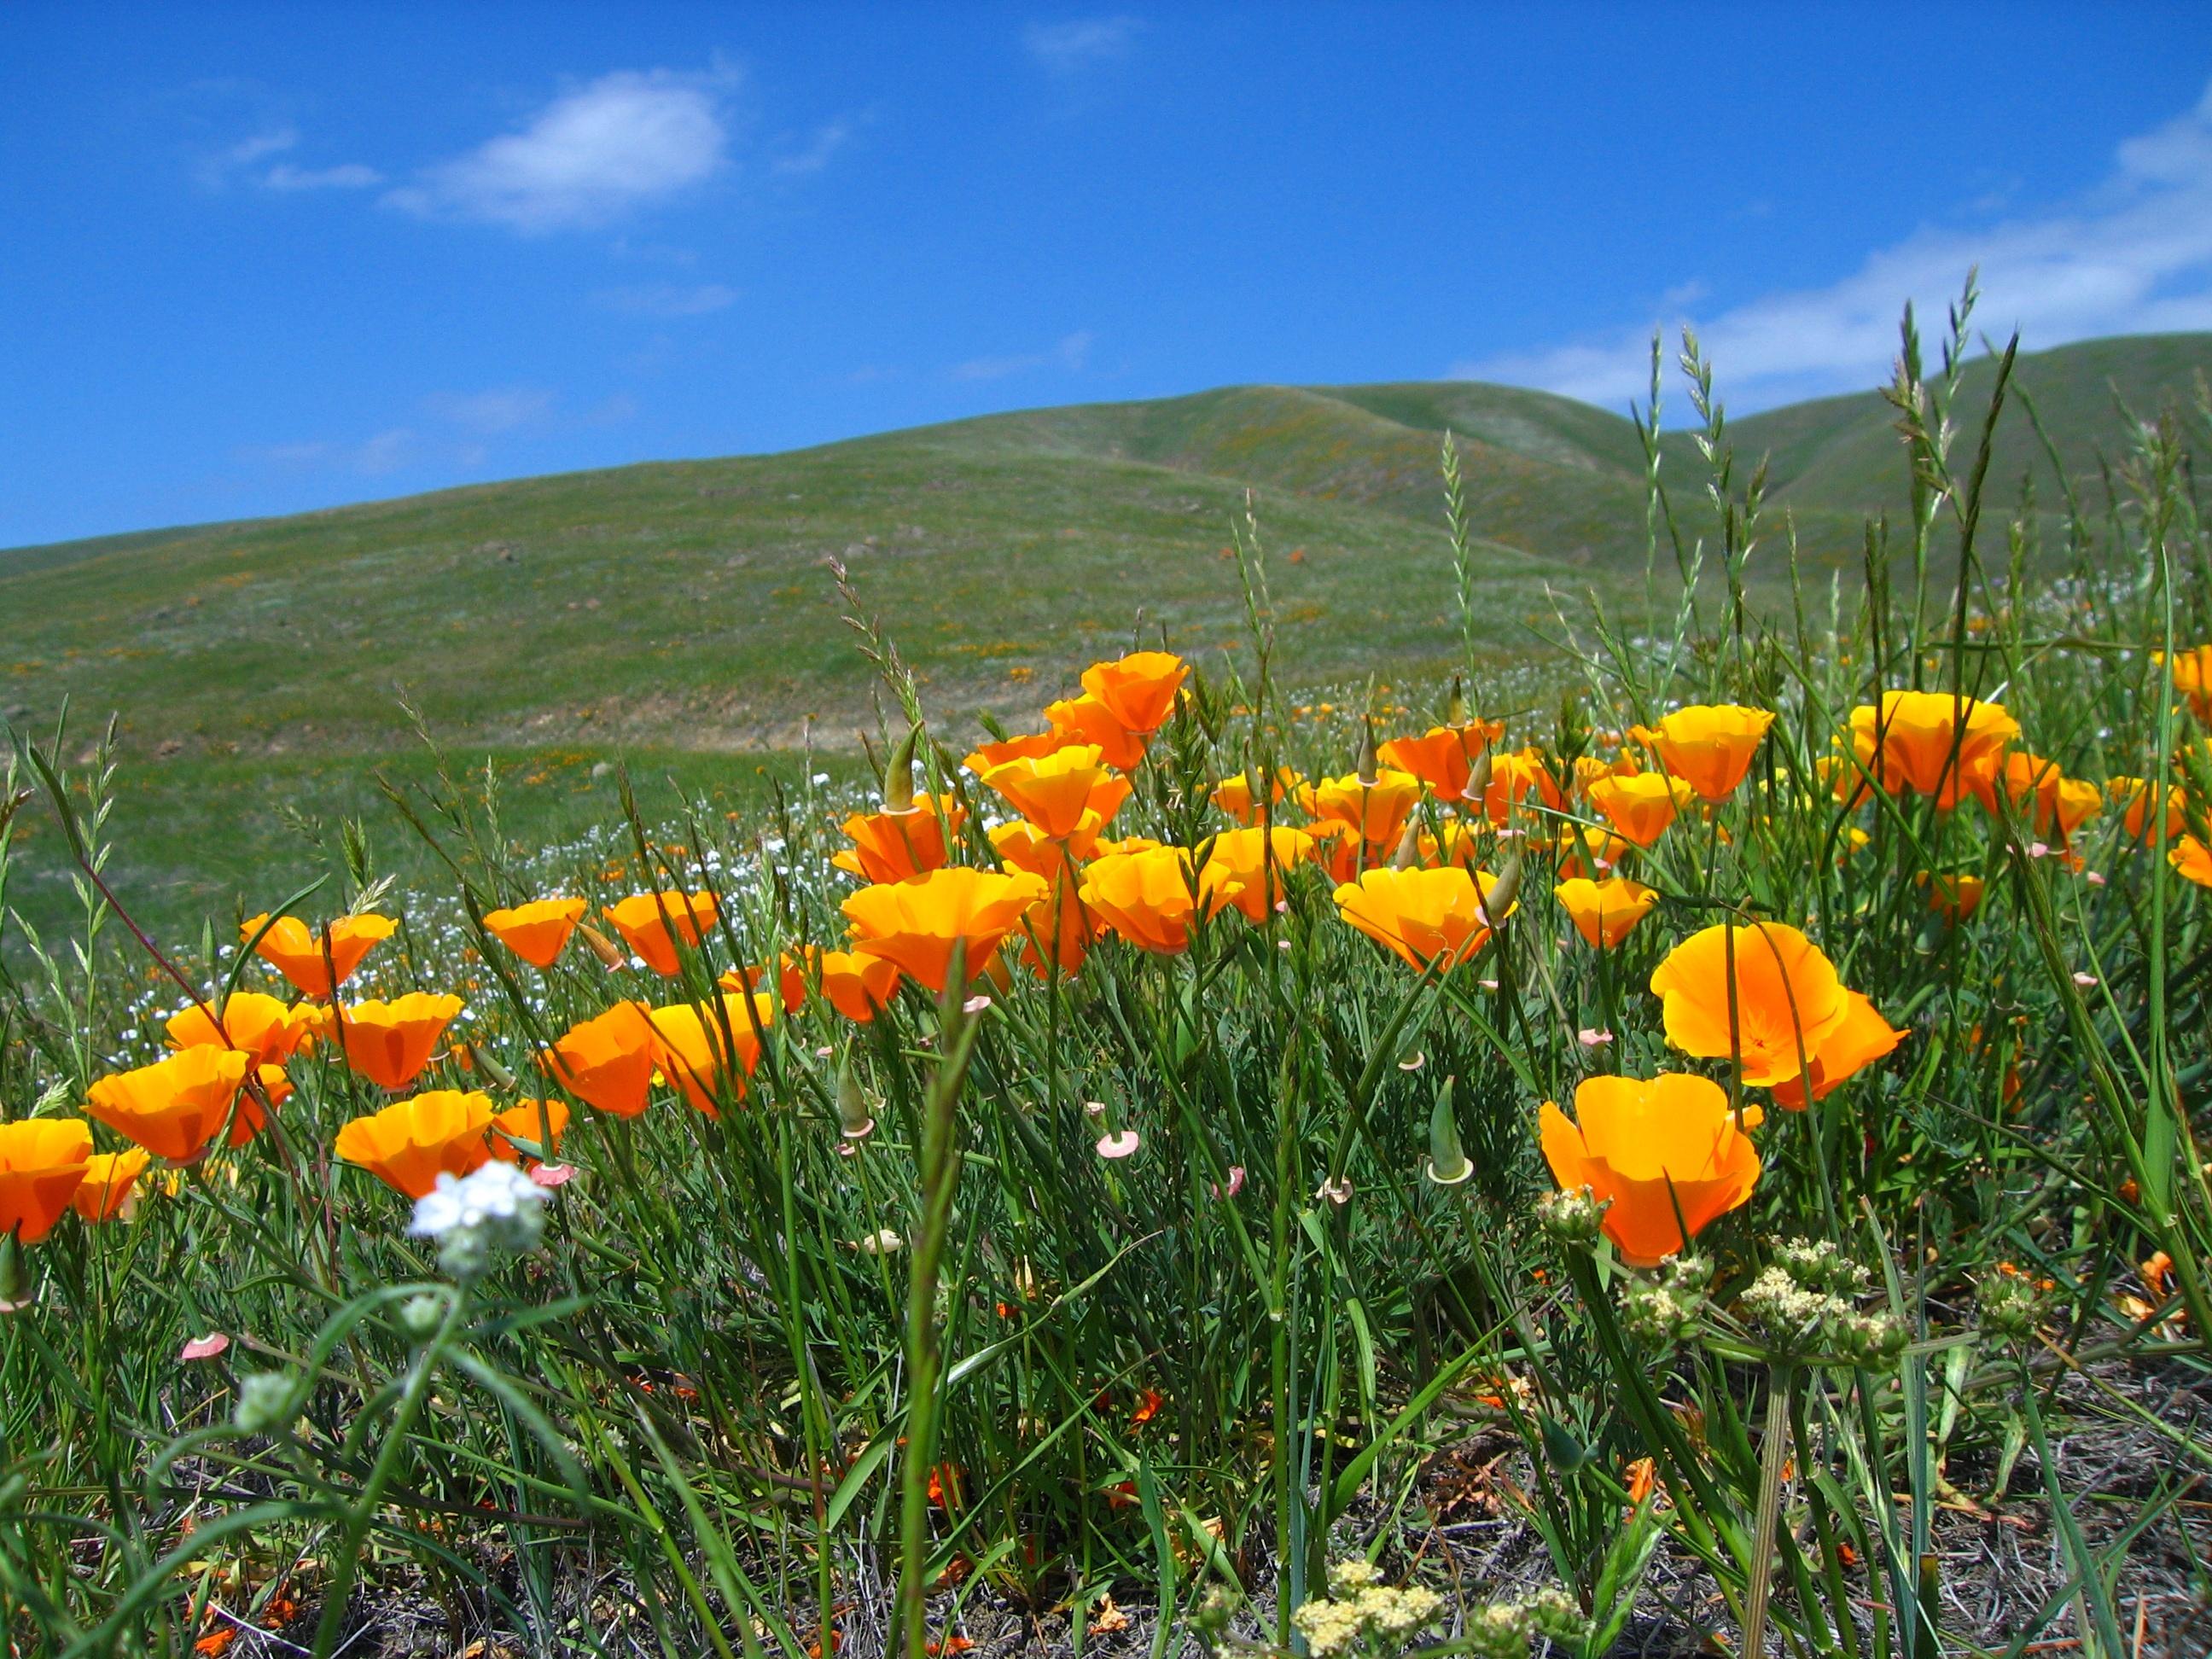 Coyote Ridge OSP - California Poppy - CH - APR-26-2012 - 1.jpg